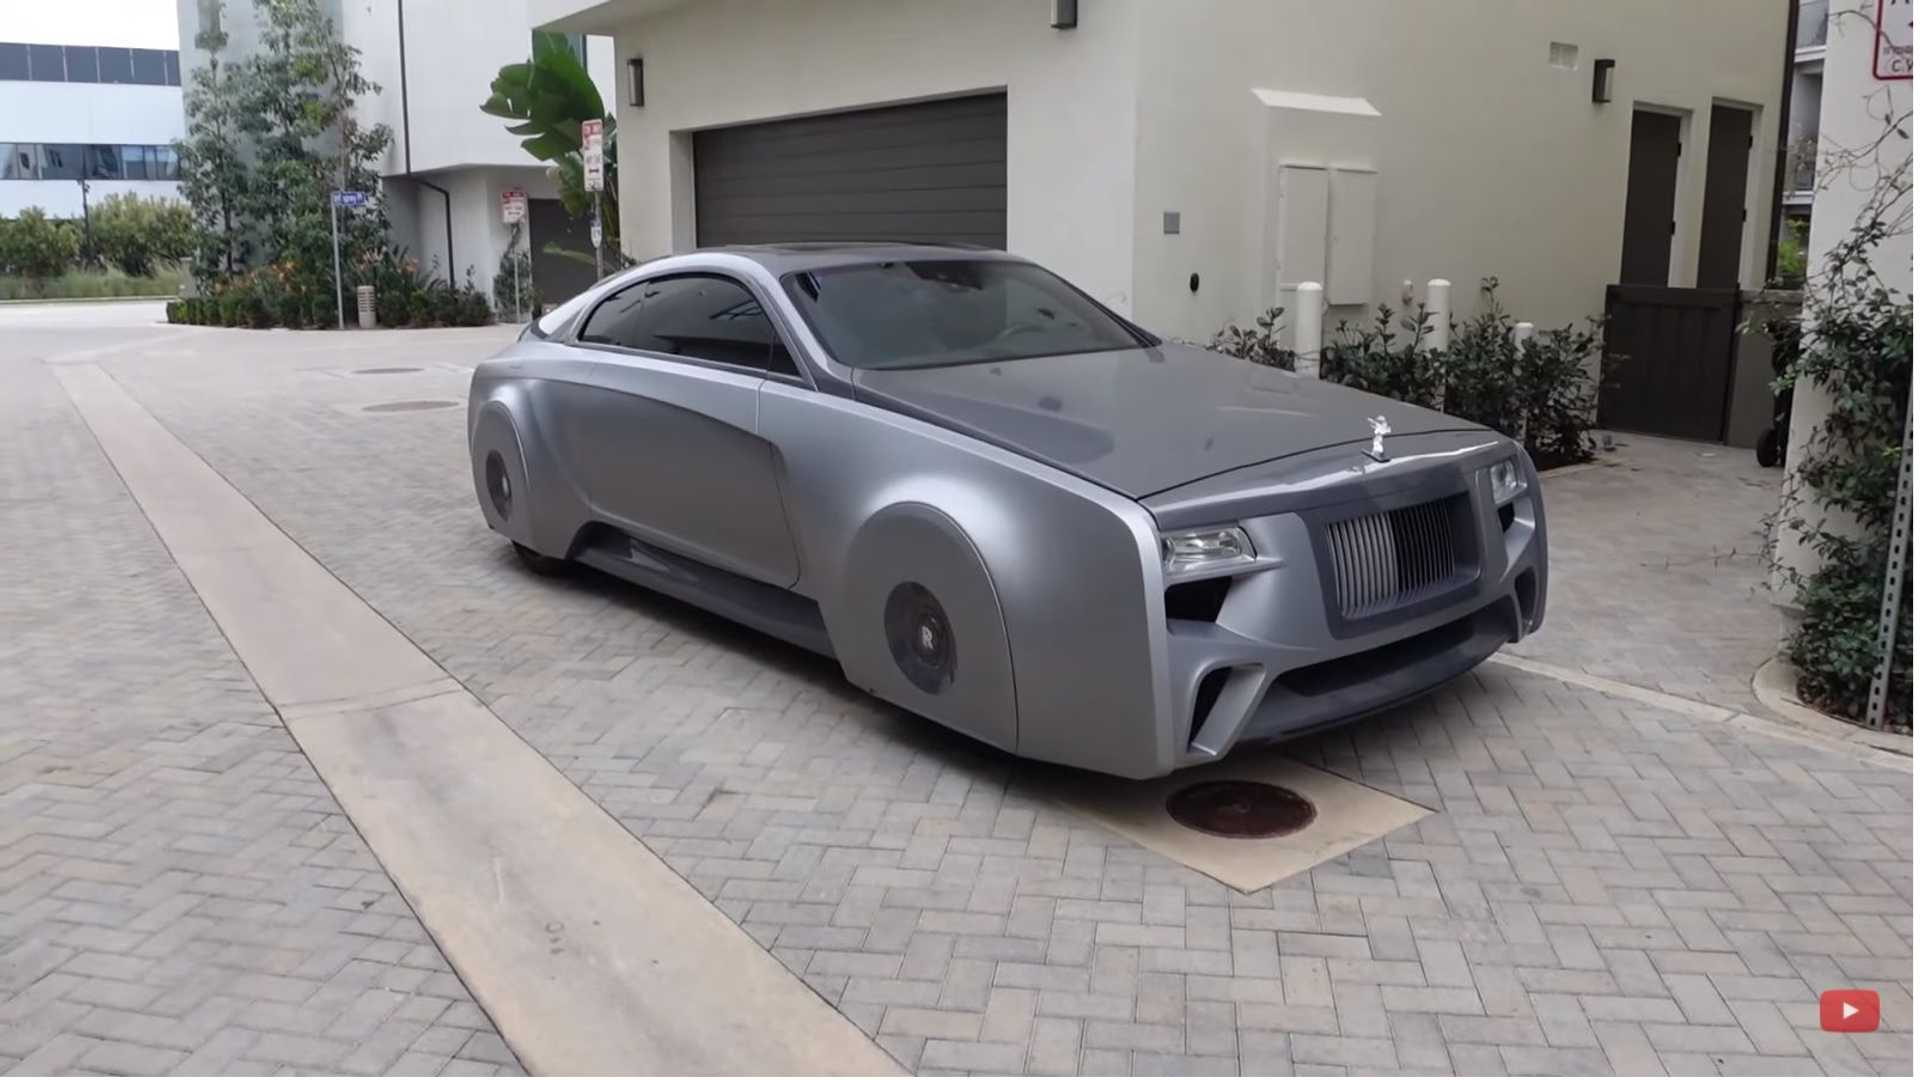 Justin Bieber's Rolls-Royce